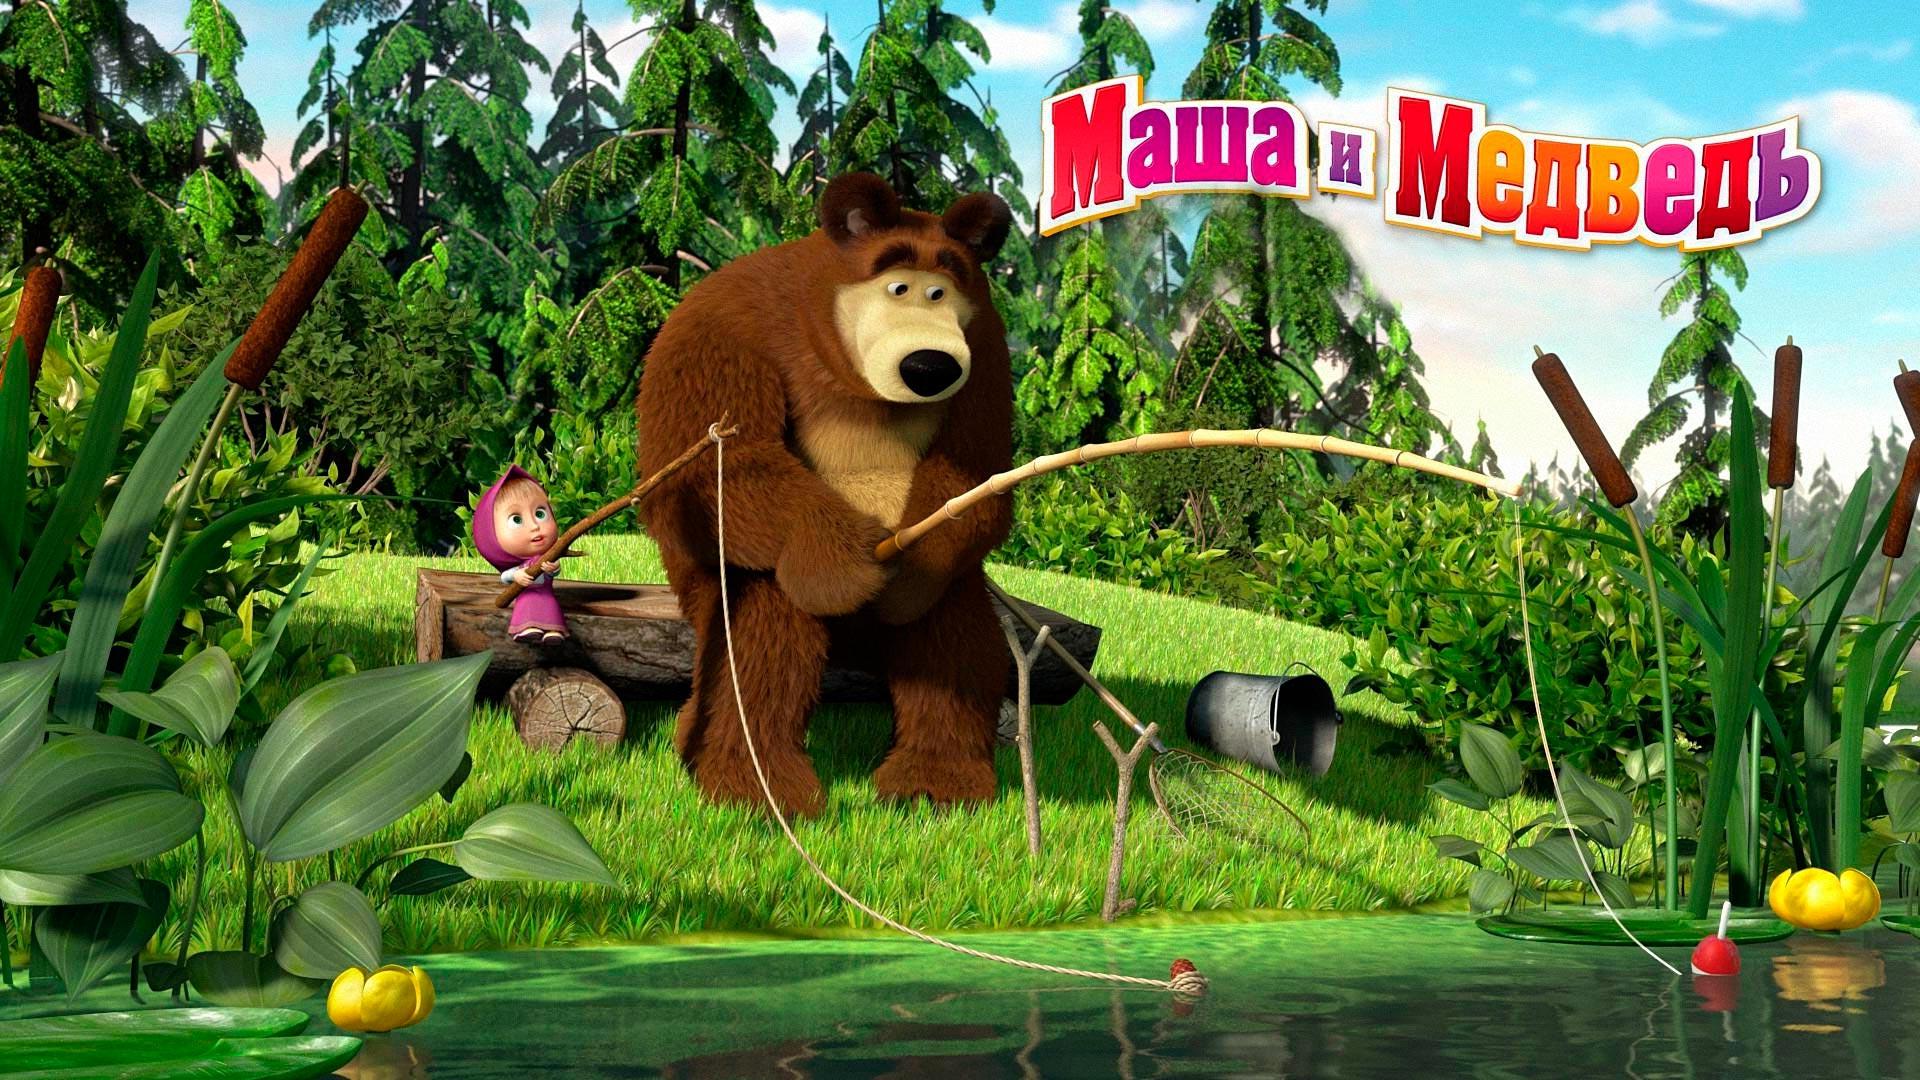 Маша и медведь рыбачат маша и медведь